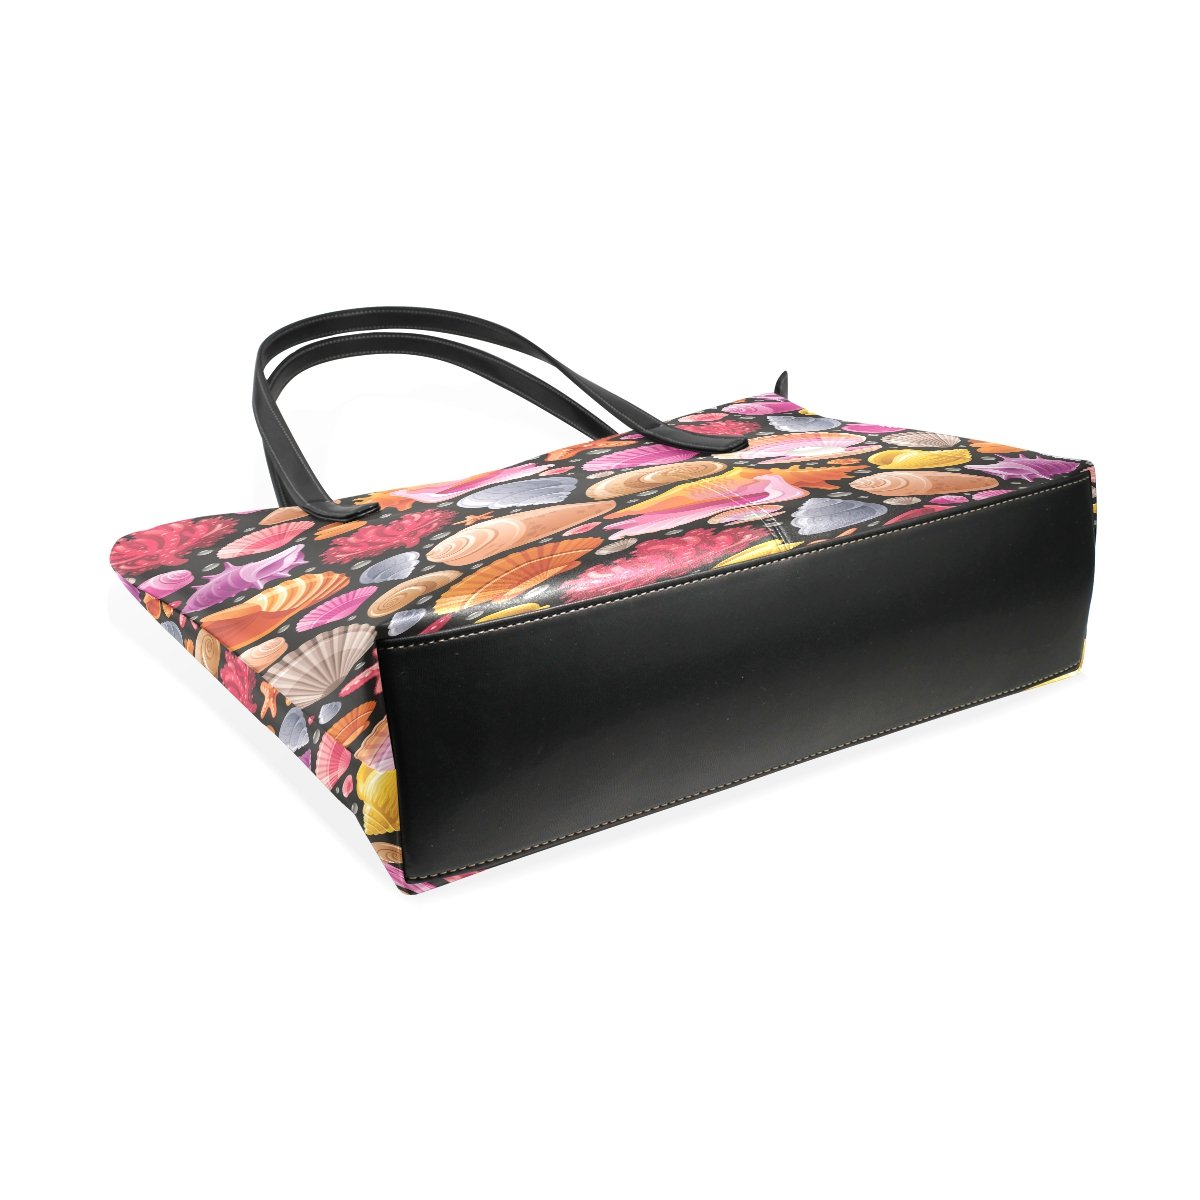 Womens Leather Top Handle Shoulder Handbag Shell Large Work Tote Bag